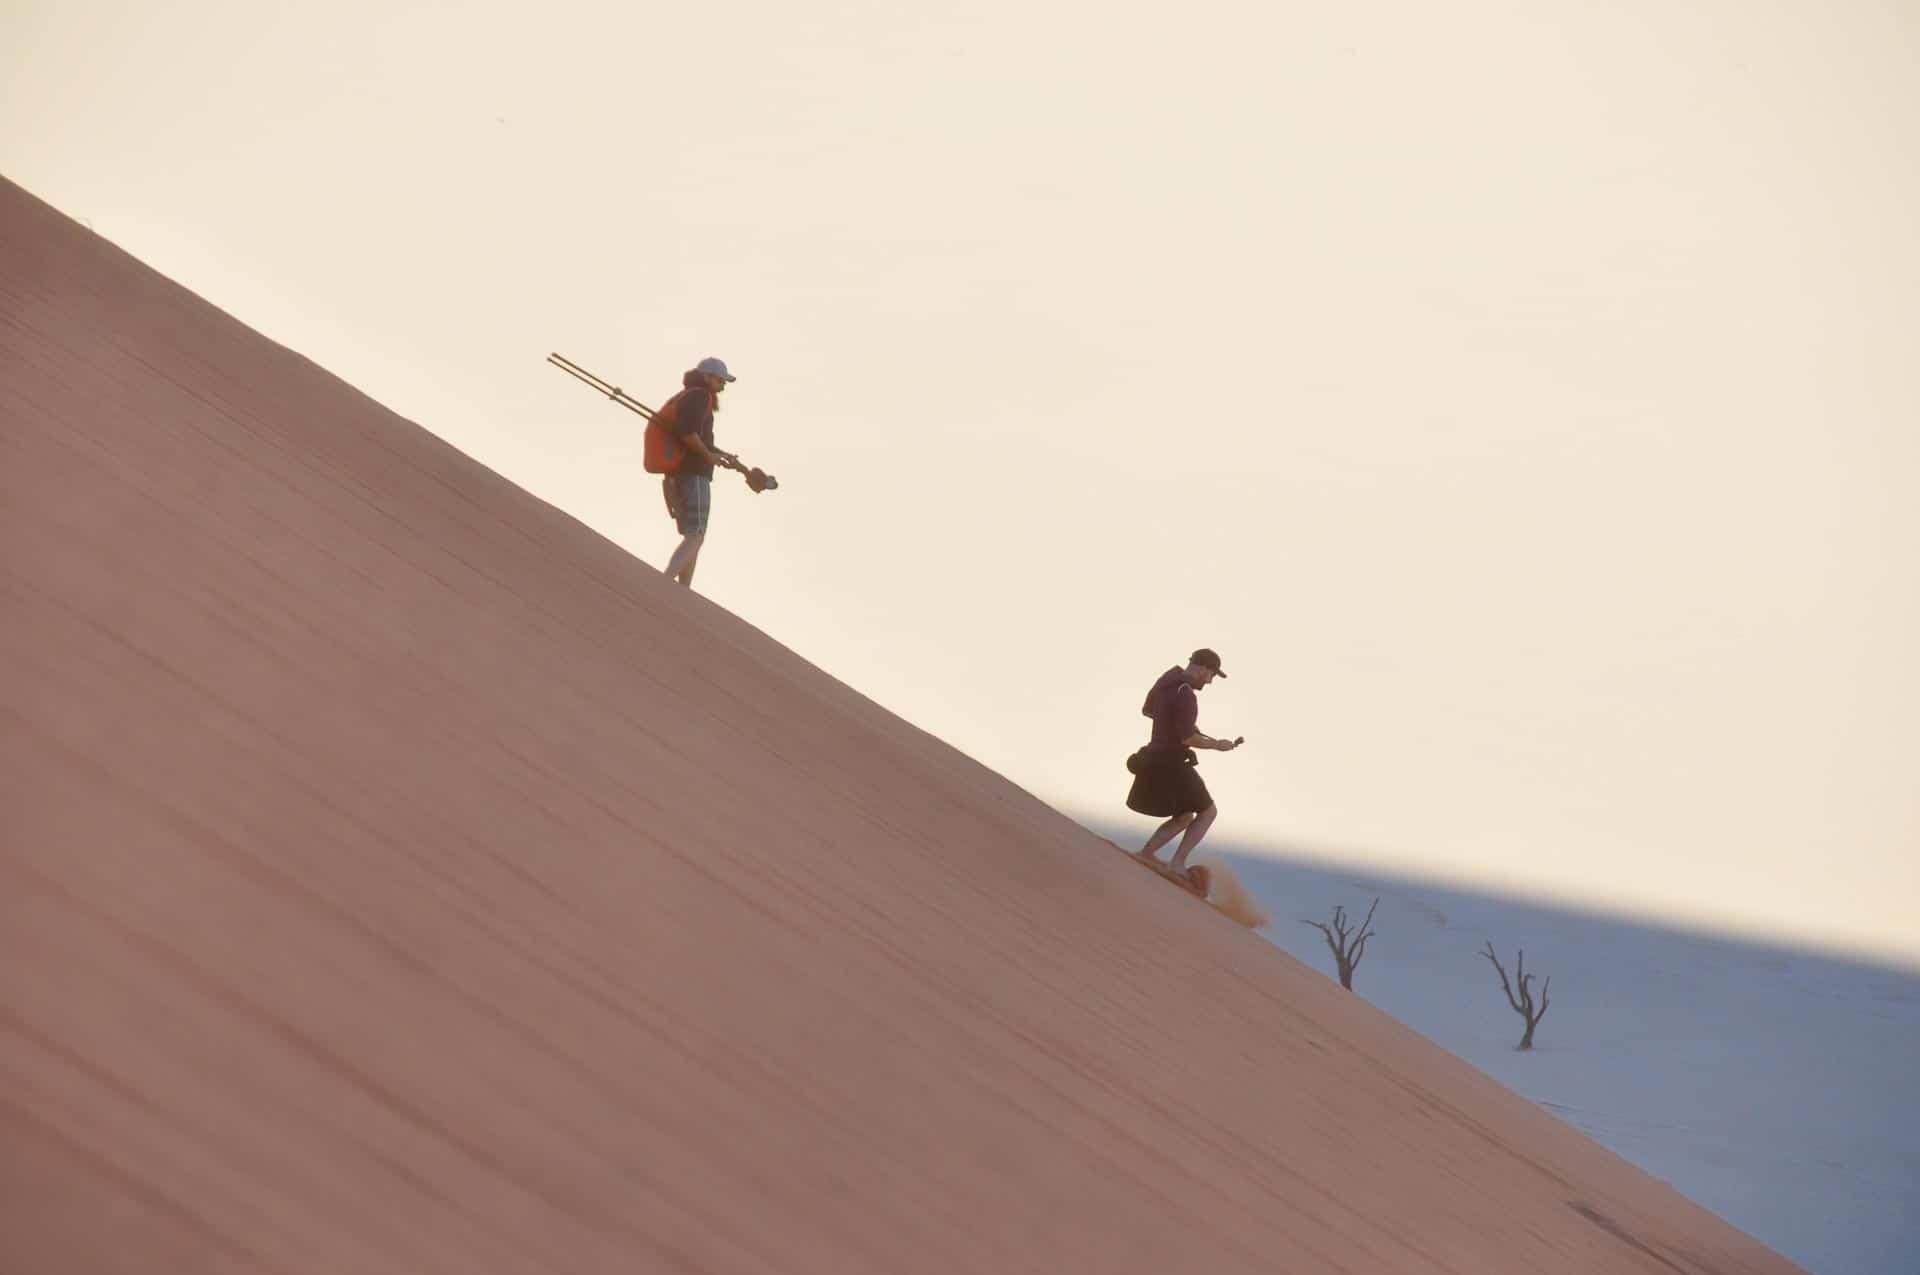 Sossuvlei-Wueste-Namib-Namibia-Globetrotter-Select-19